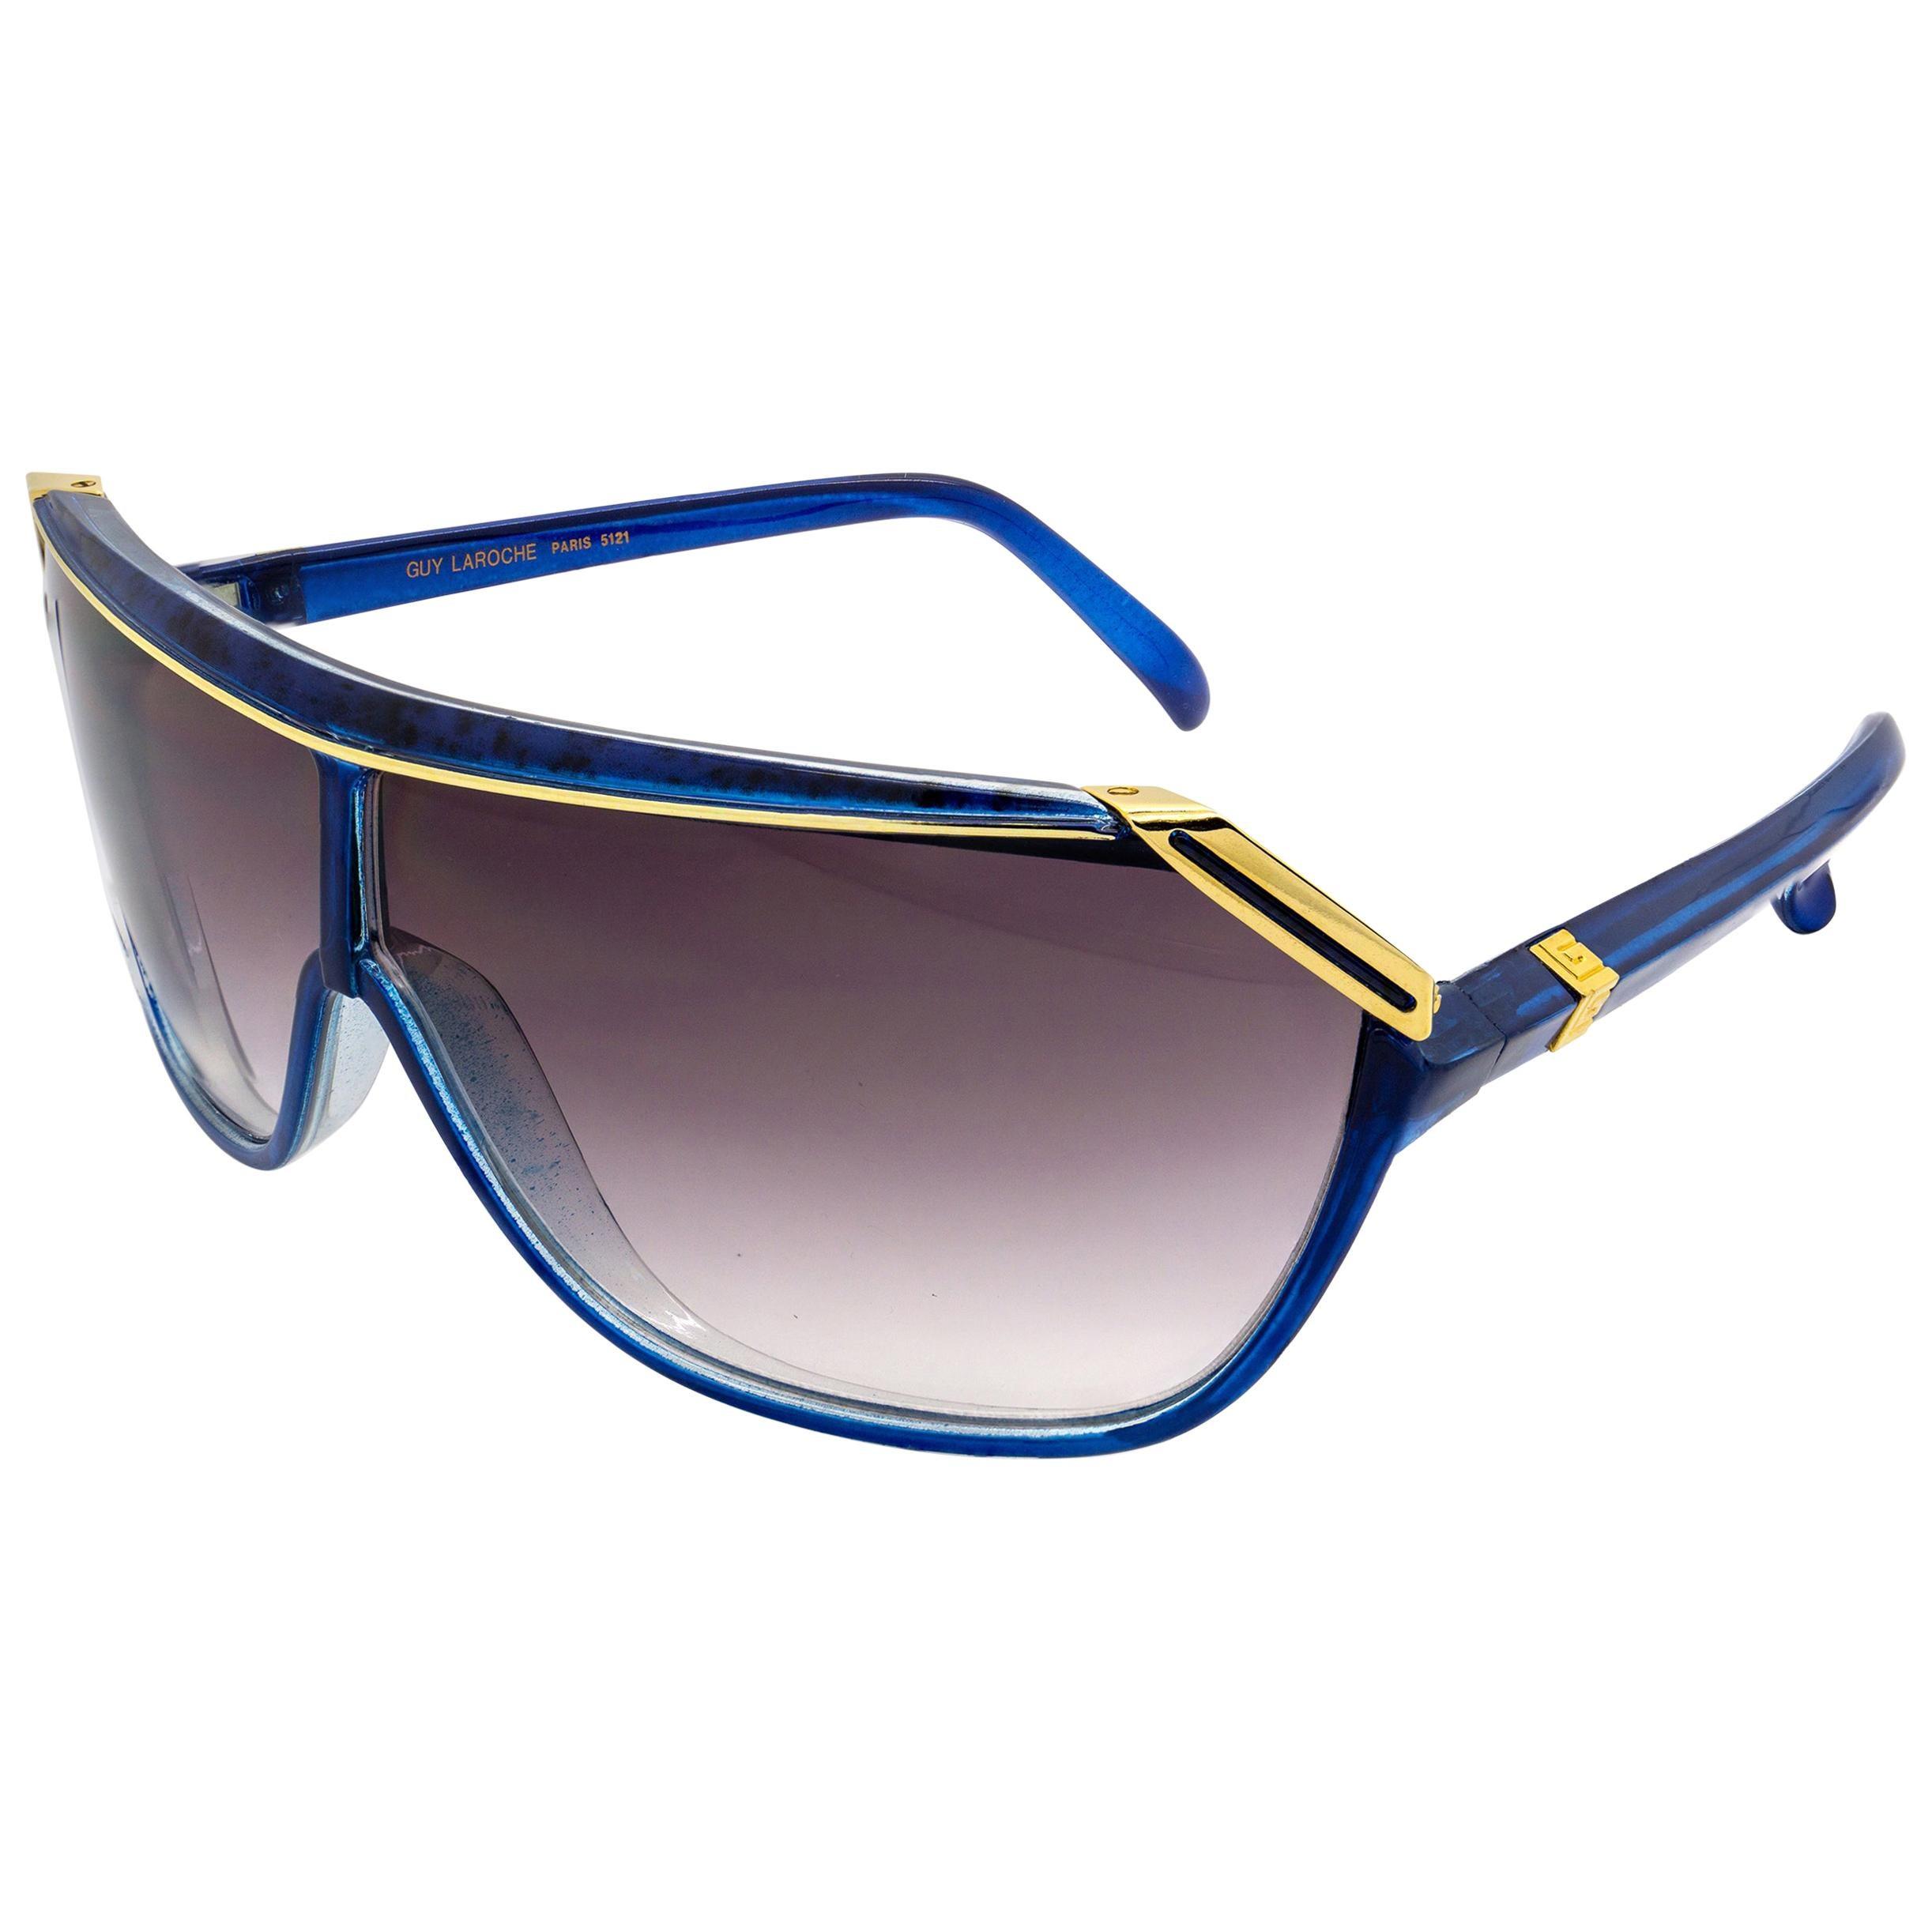 Guy Laroche blue vintage sunglasses, made in France